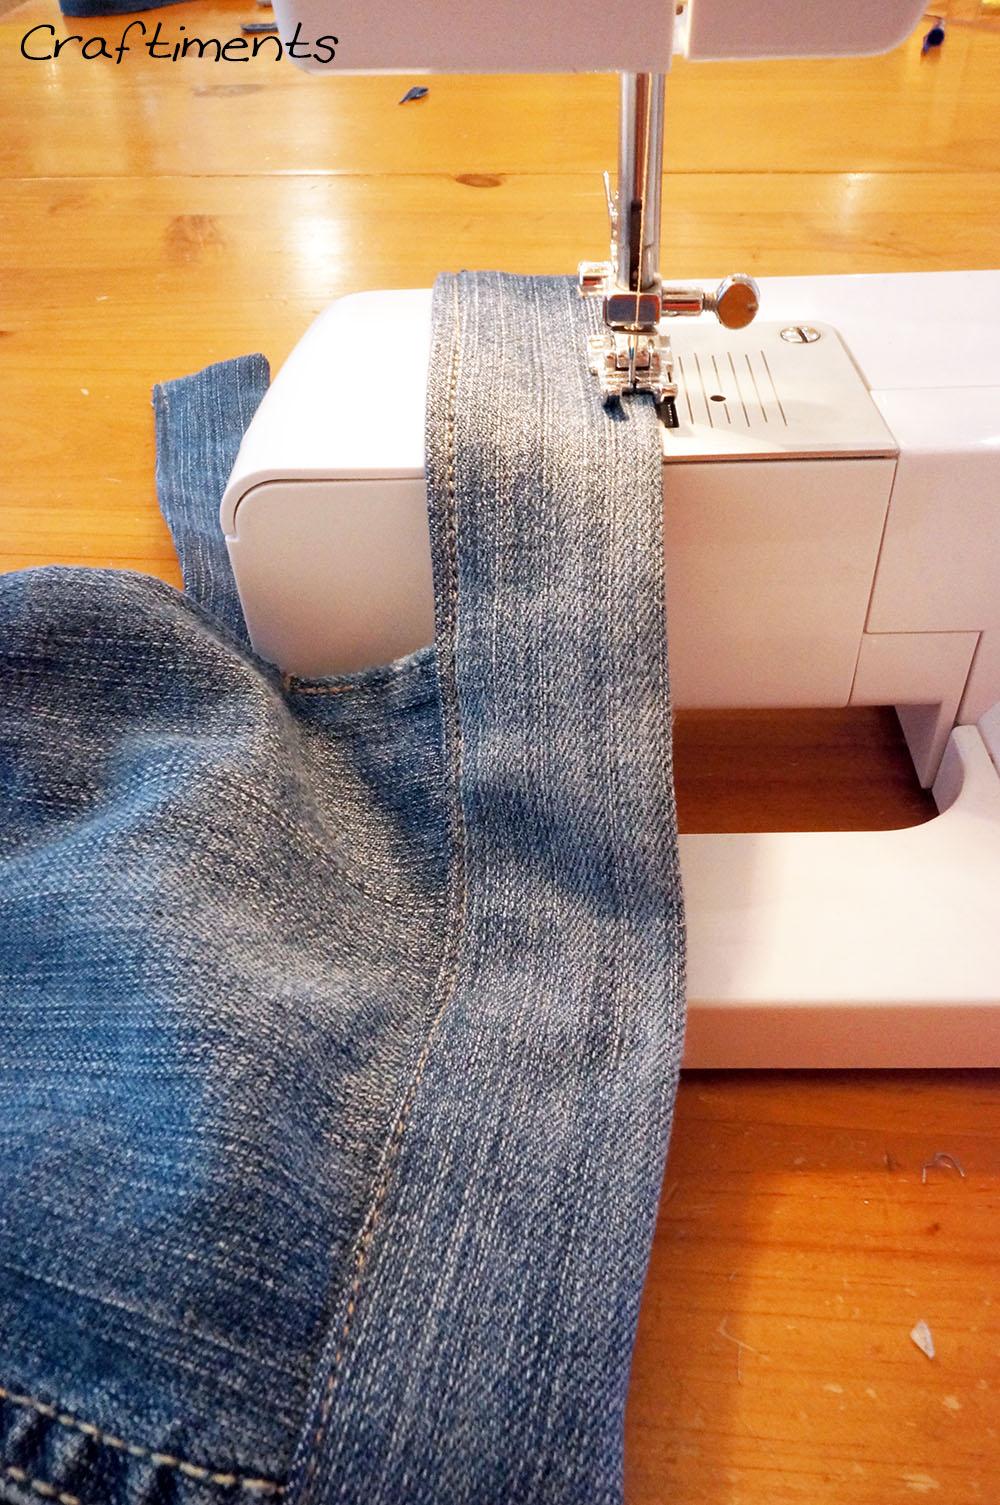 Stitch along lower edge.